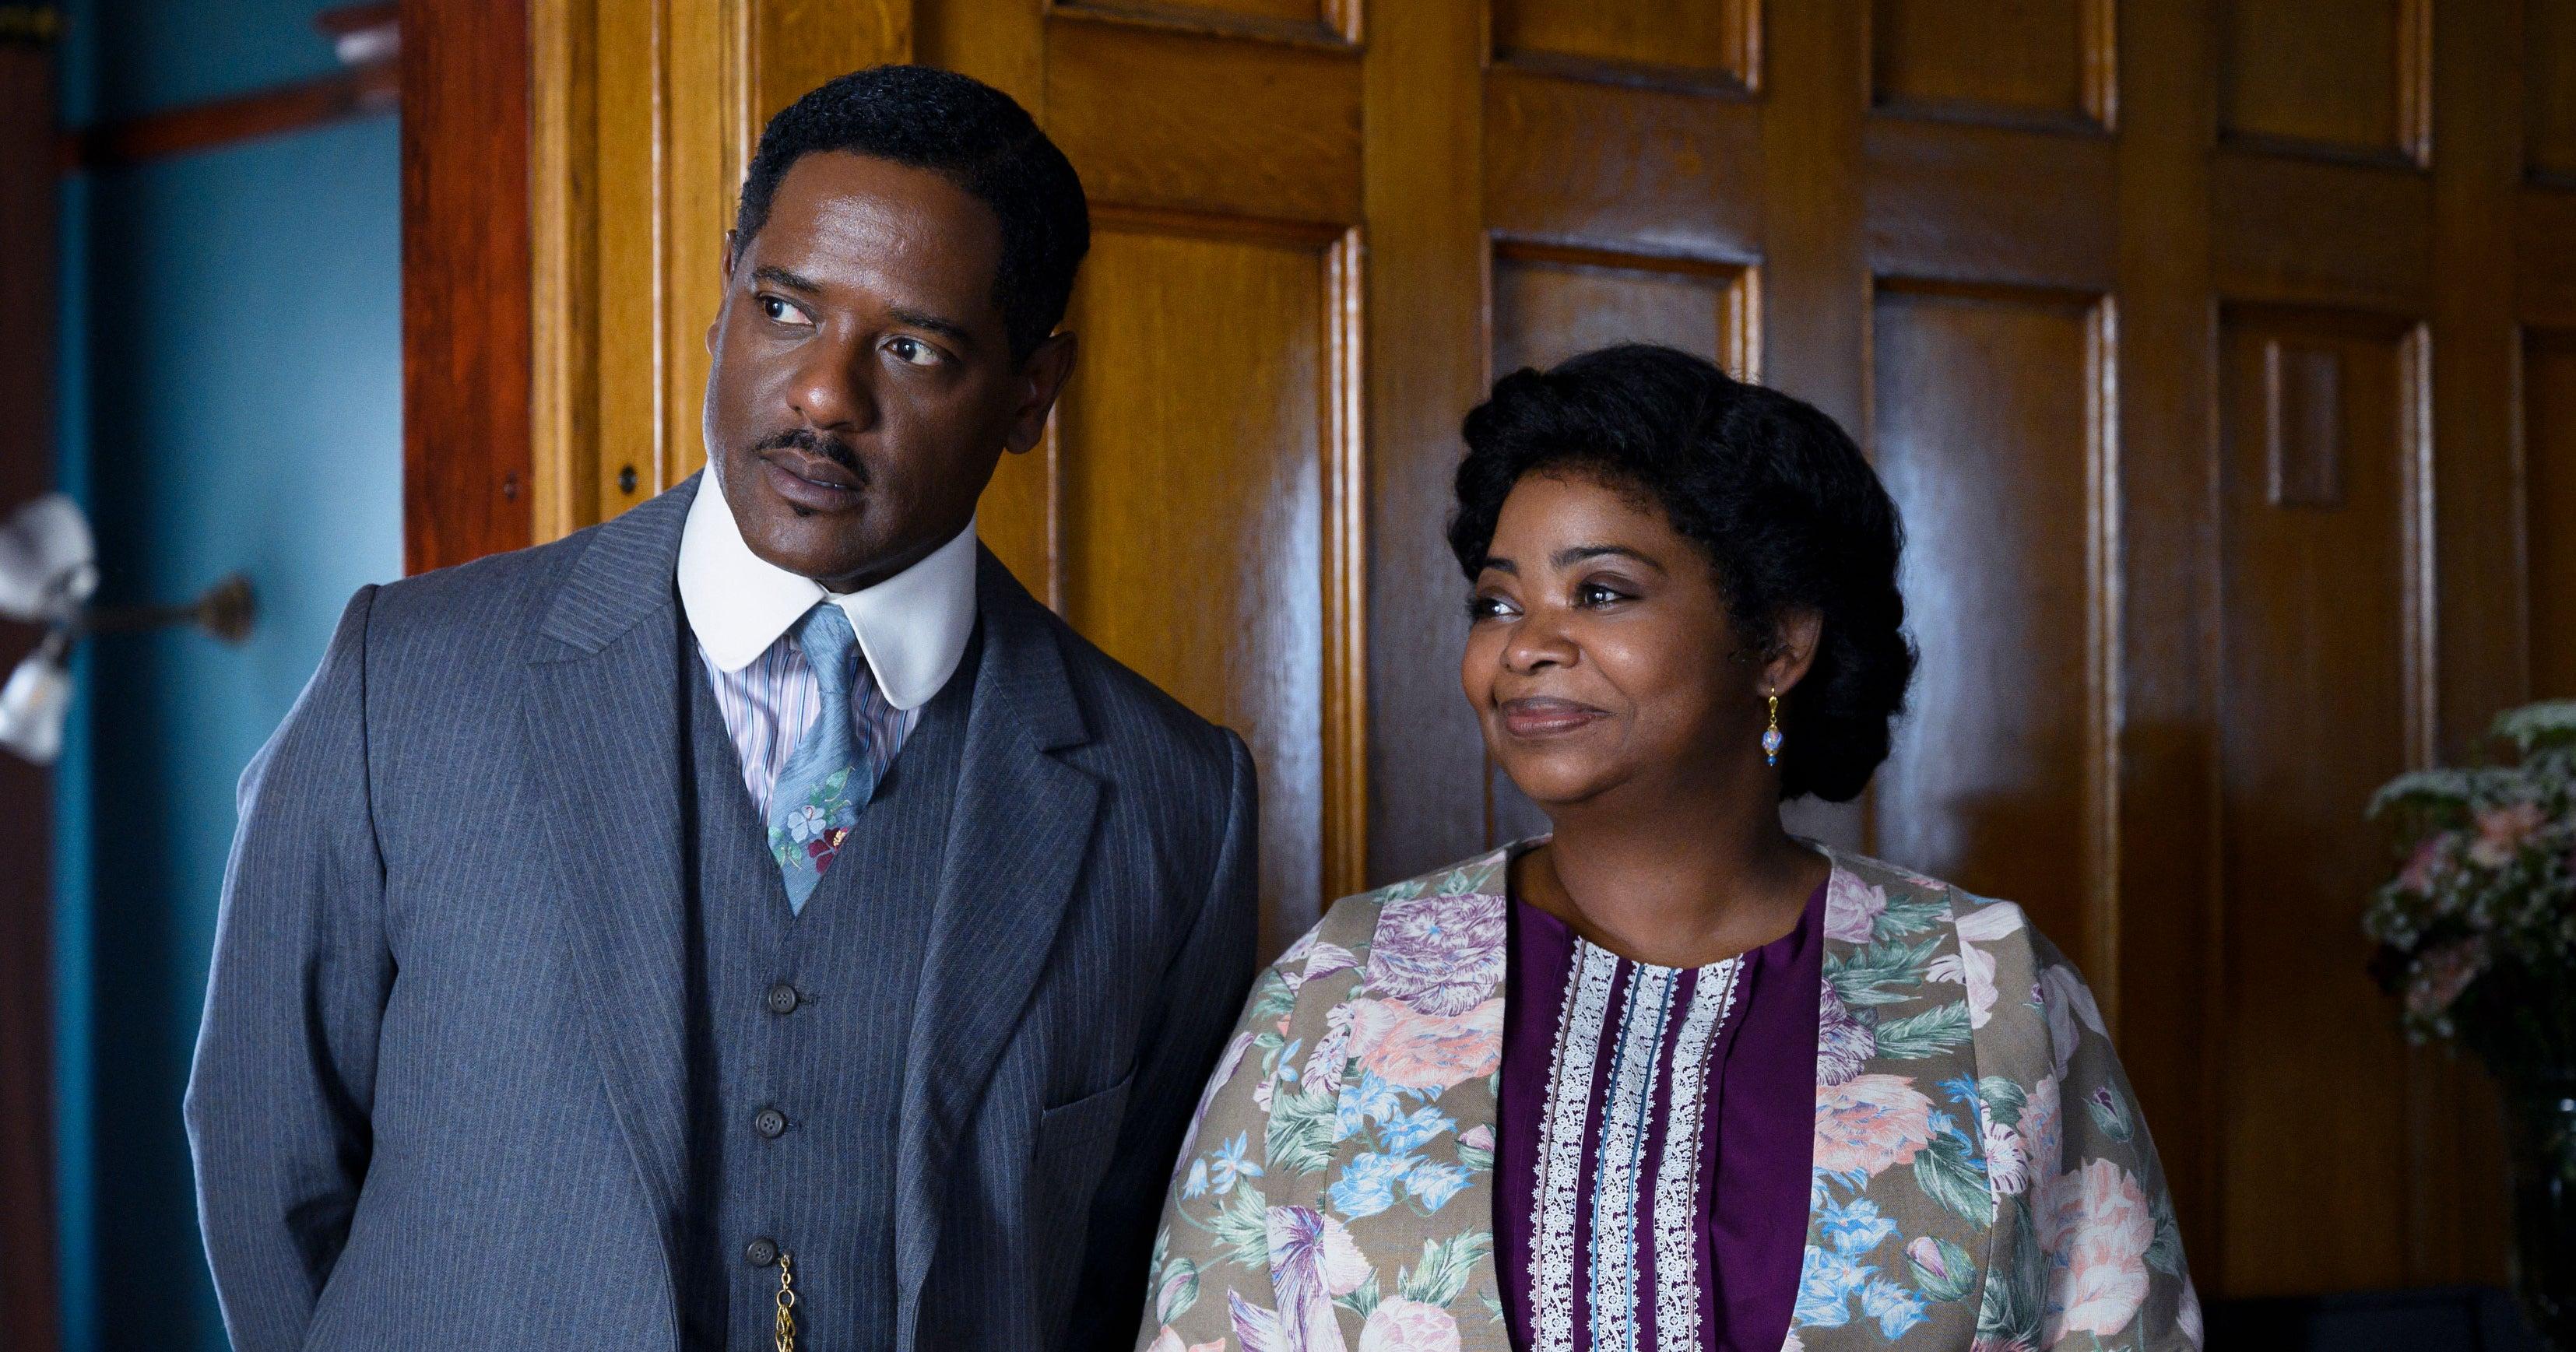 Netflix's New Original Limited Series Wants You Remember Madam C.J. Walker's Legacy